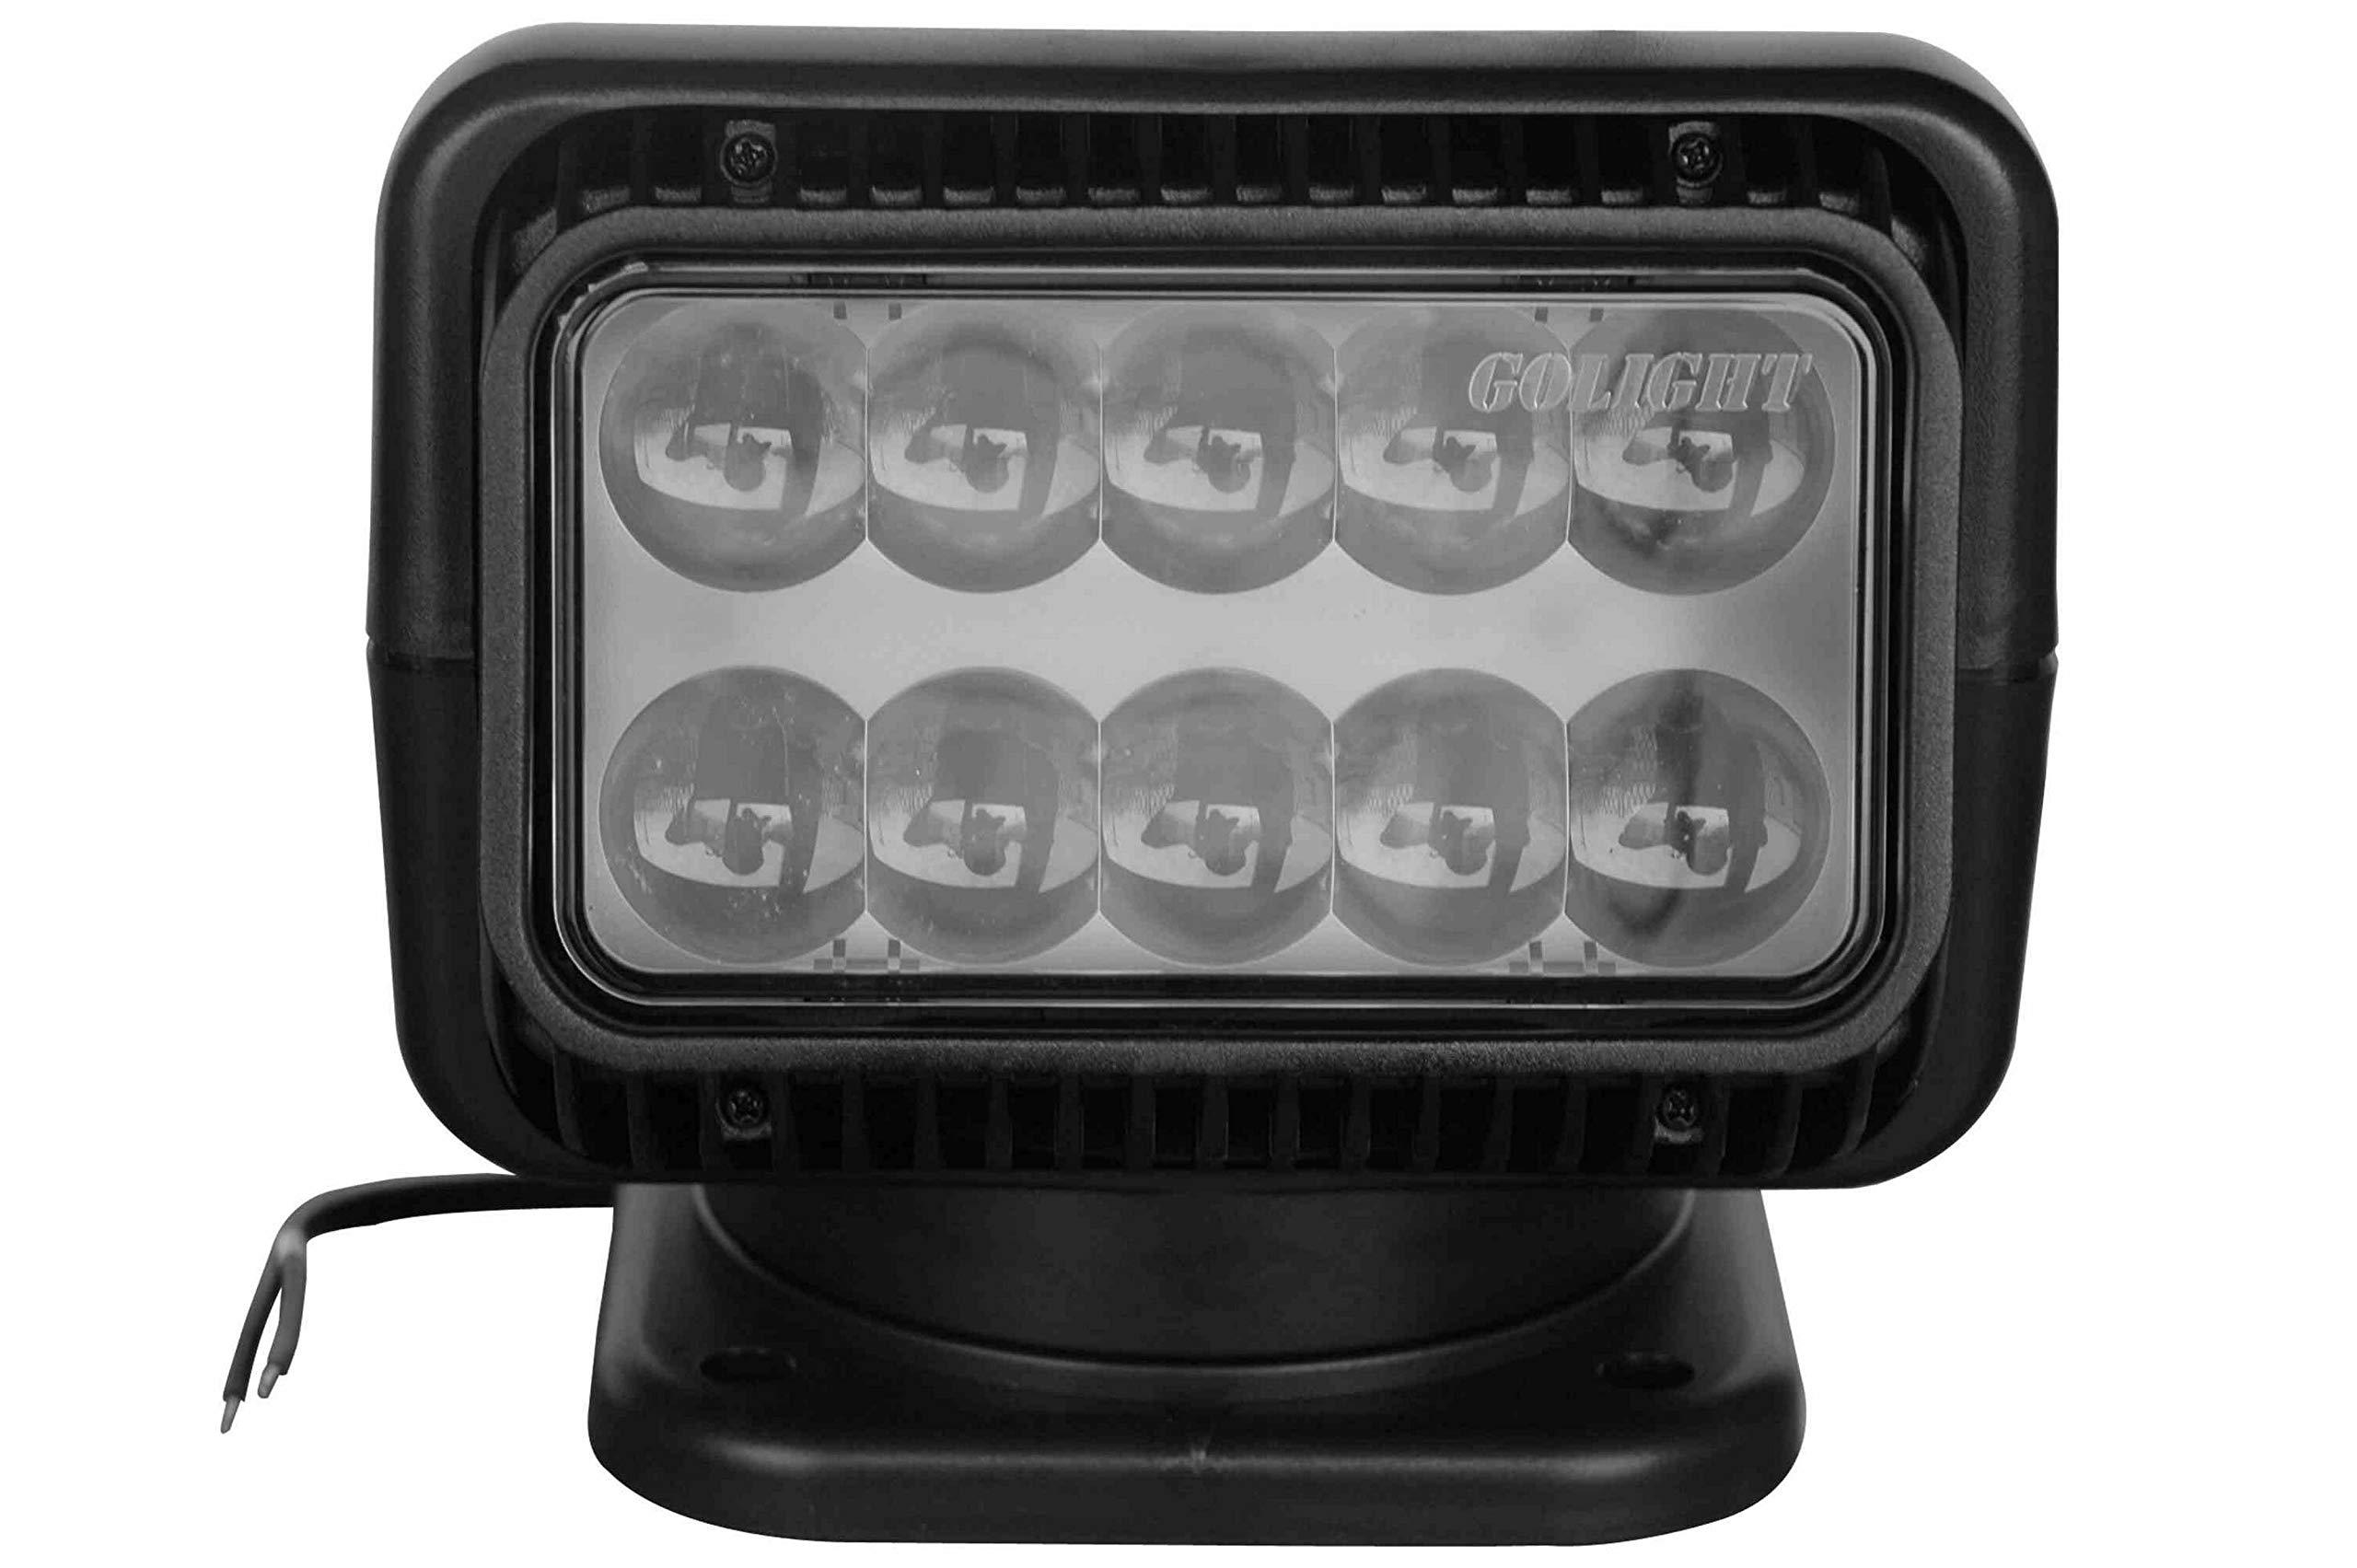 20514 Golight Dual Wireless Remote, LED Spotlight - 900' Beam - Black - Perm Base - 2520 Lumen by Larson Electronics